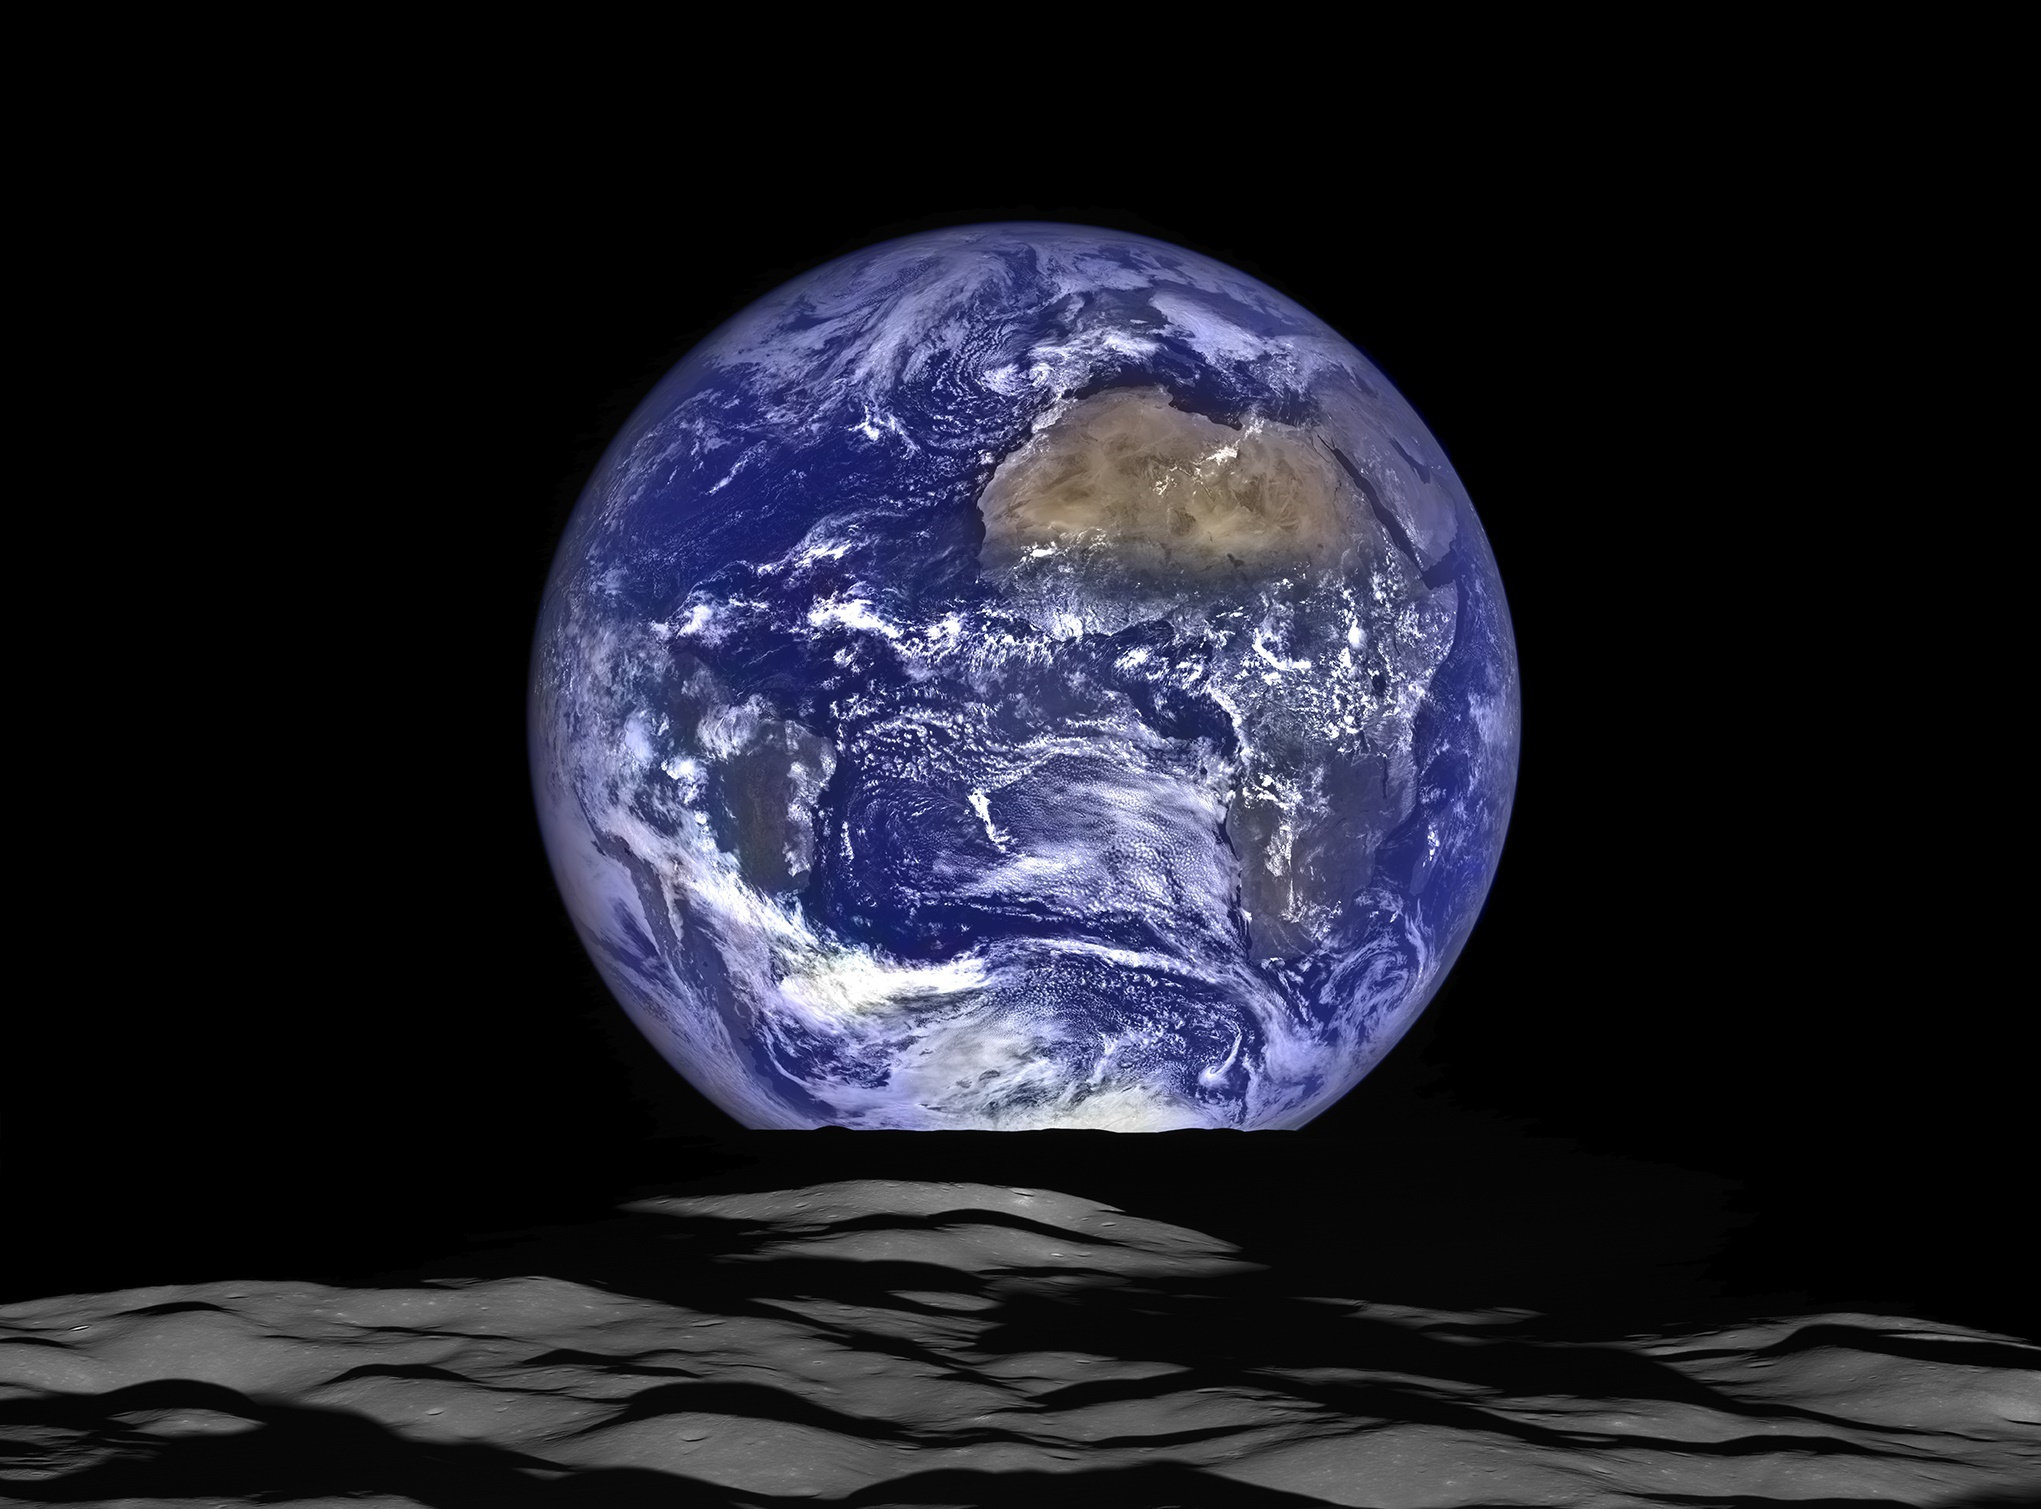 ناسا دونیانی هیجانلاندیردی: صاباح ۲۲:۰۰-دا...